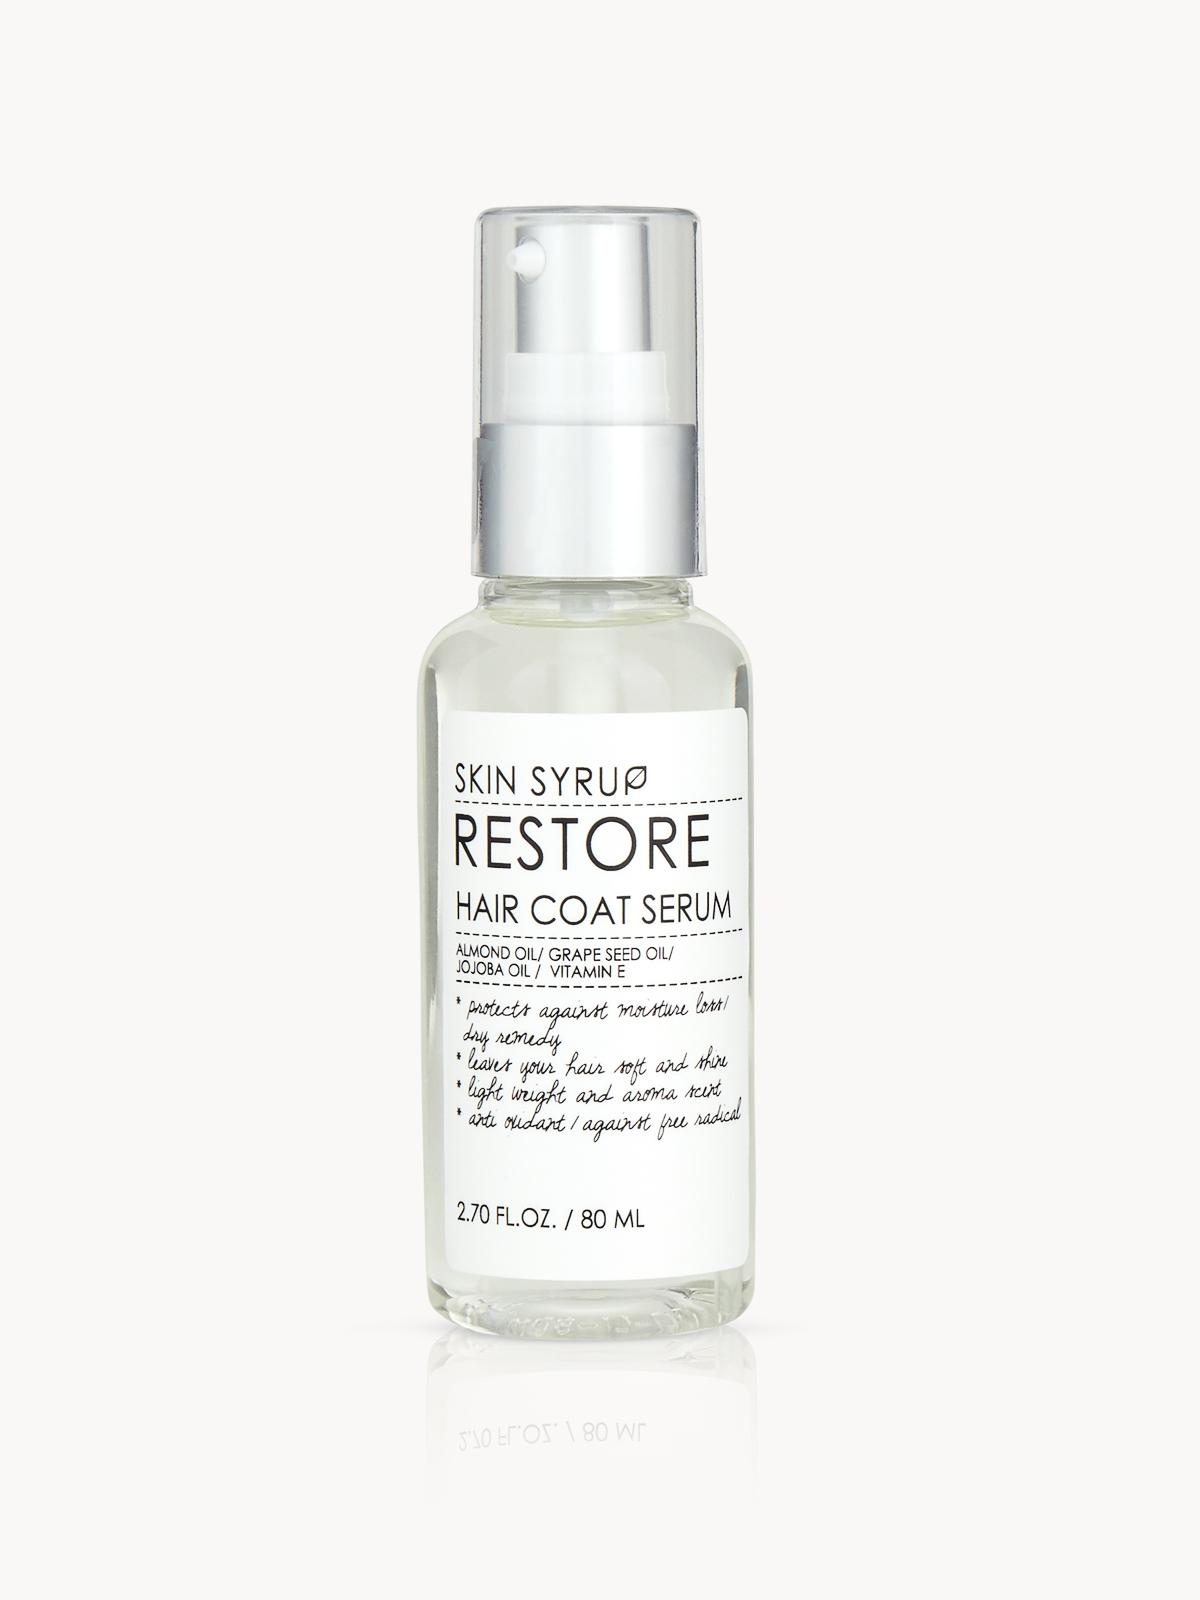 Skin Syrup Restore Hair Coat Serum